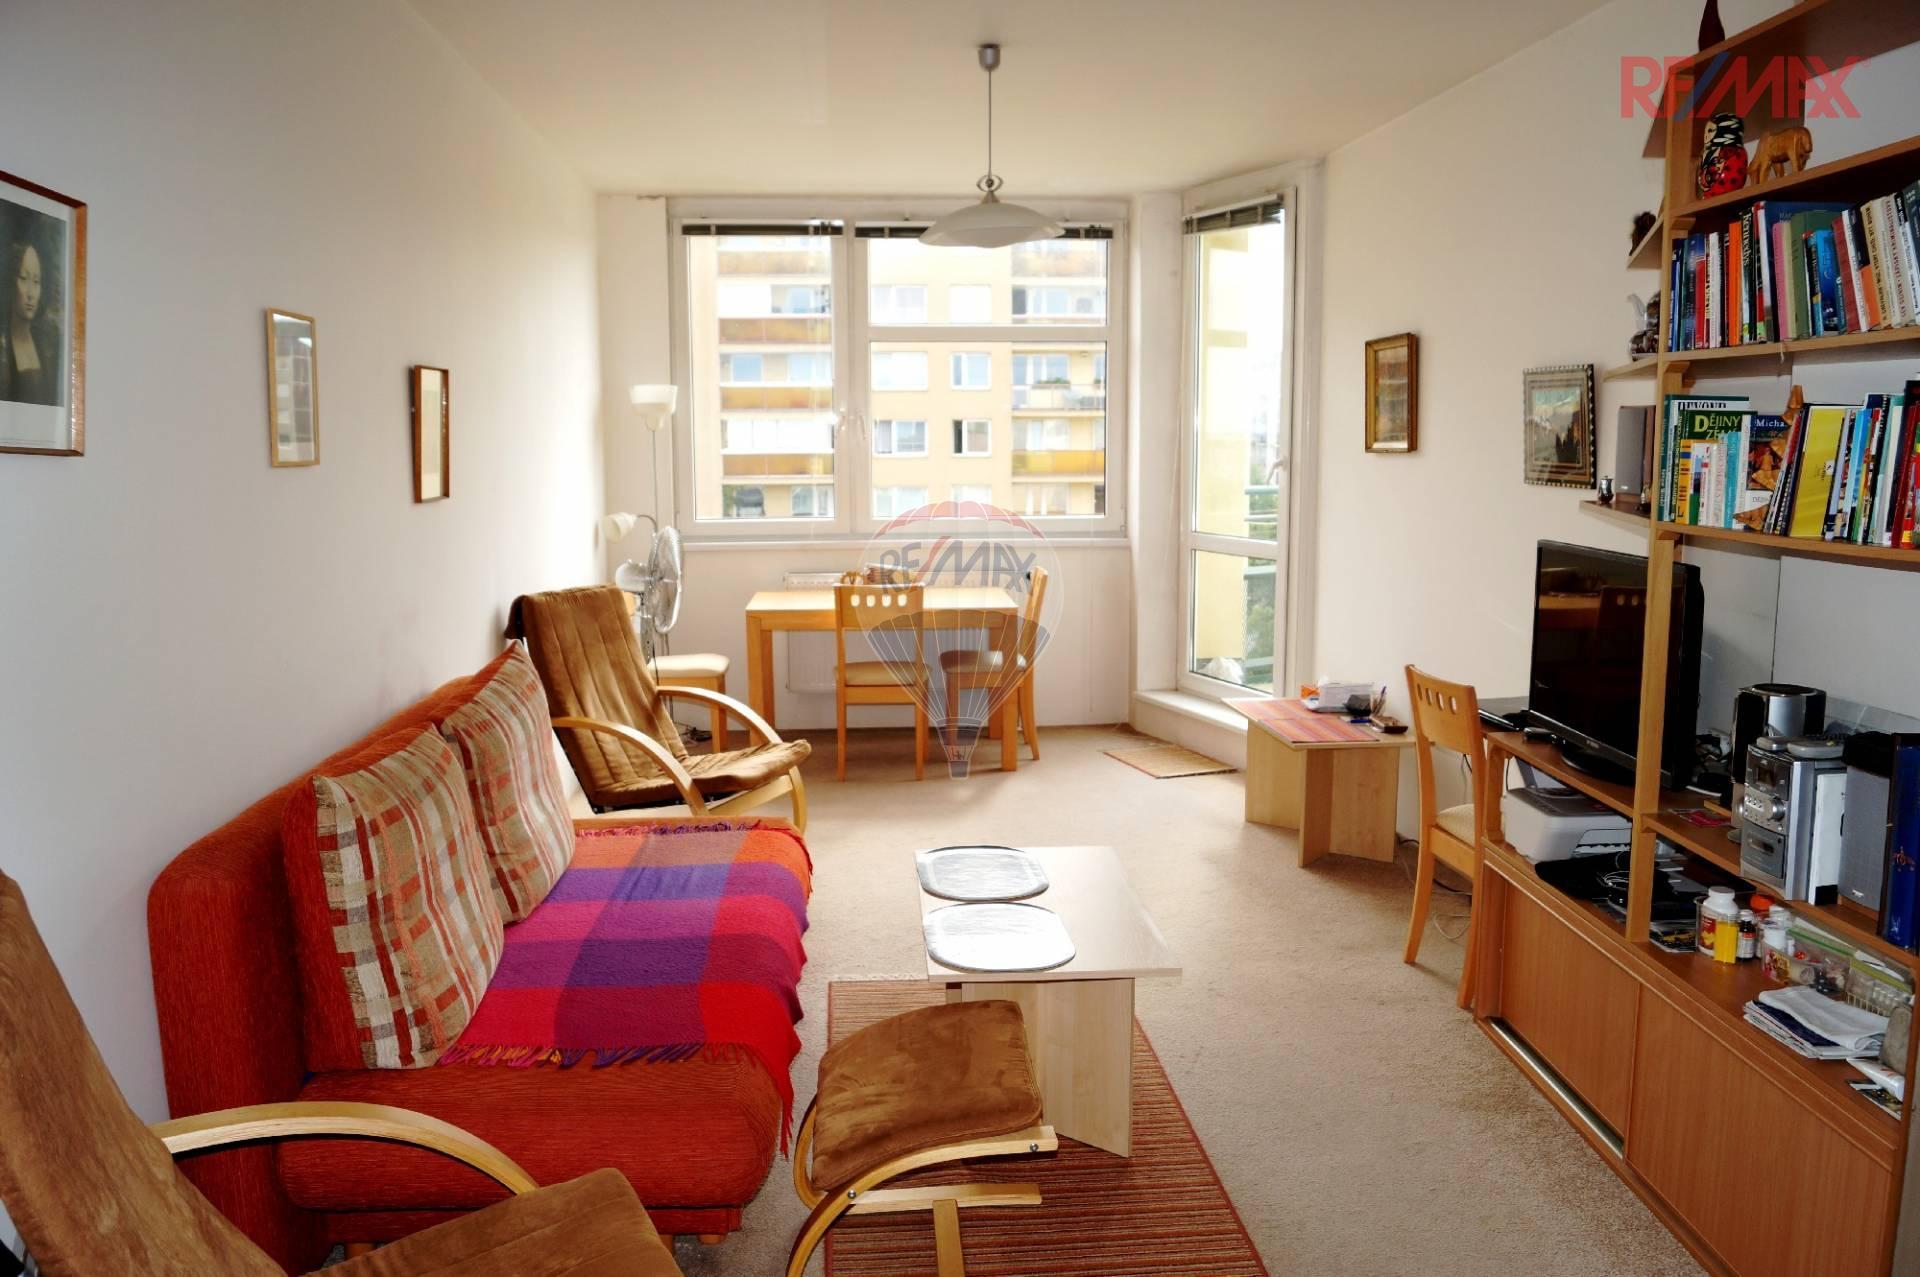 Pronájem 2+kk s komorou 47 m2 a s balkónem 5 m2